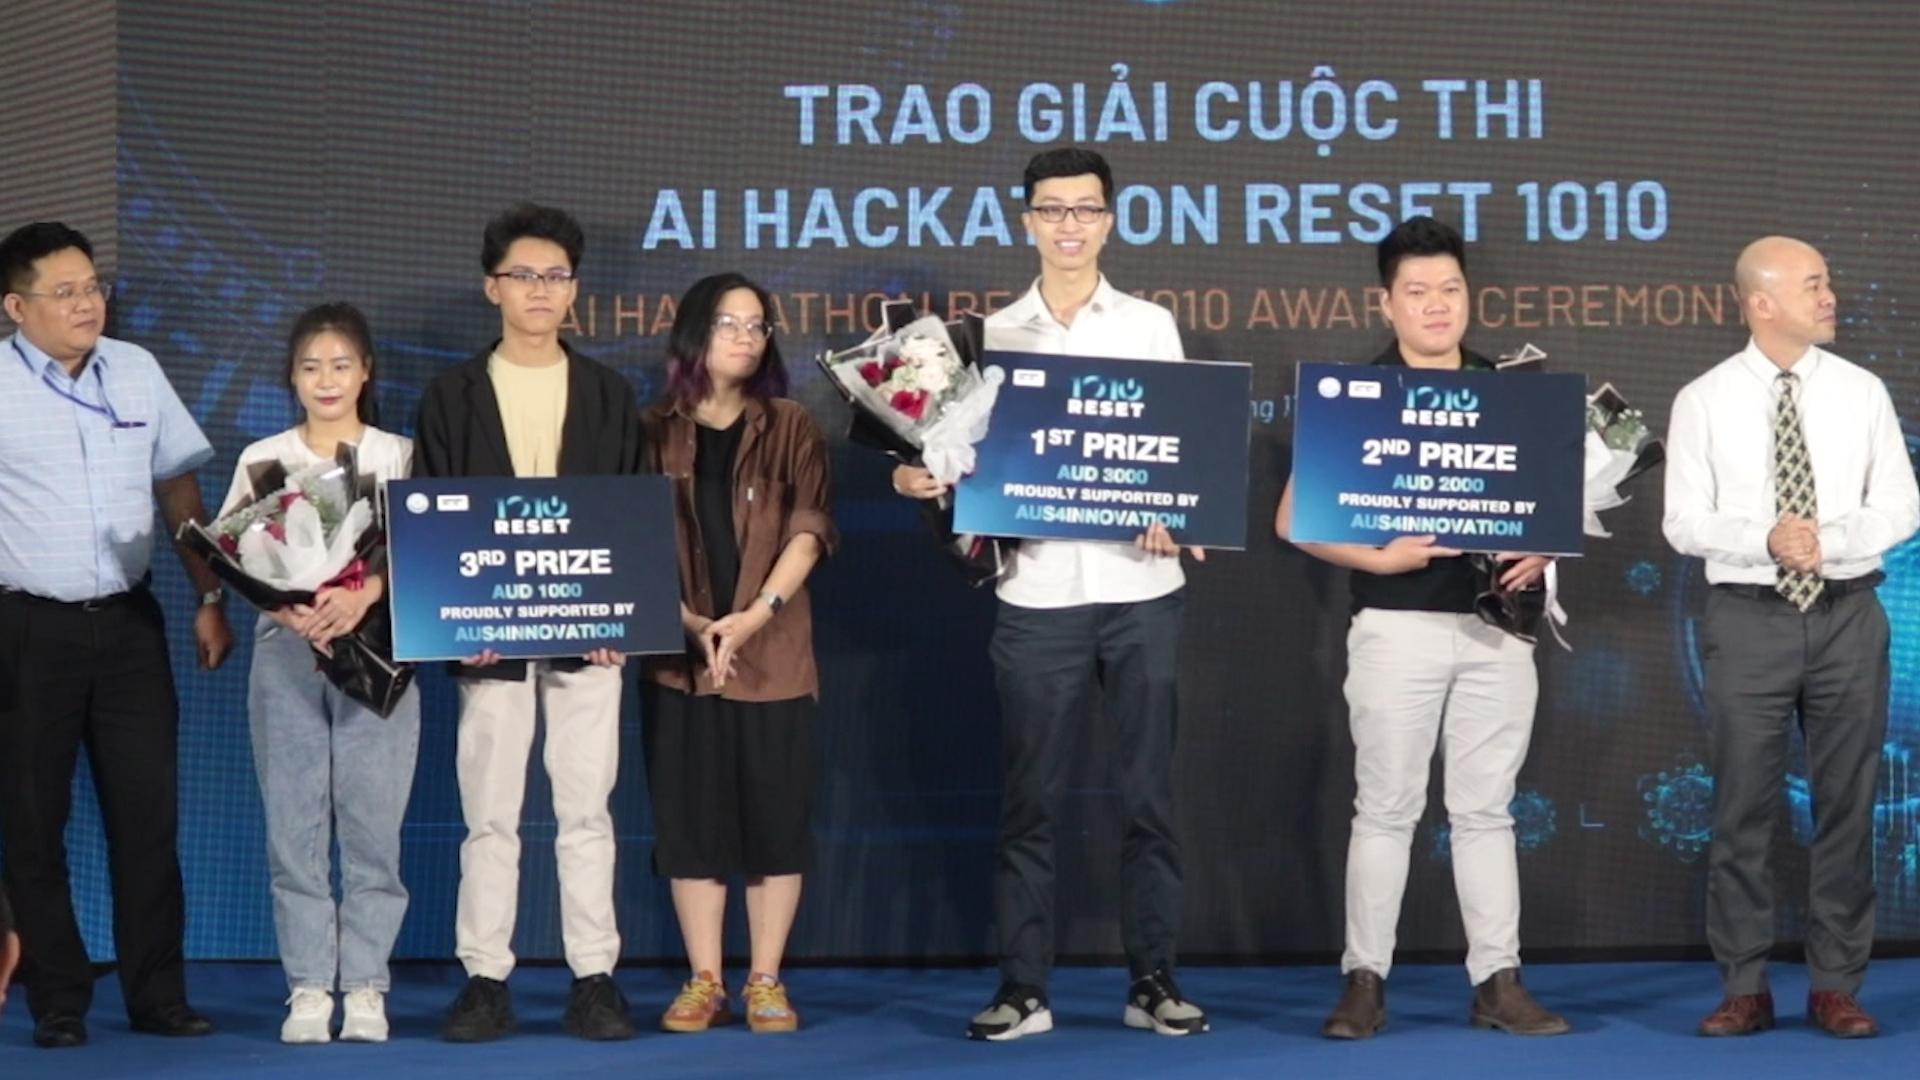 Trao Hackathon AI RESET 1010